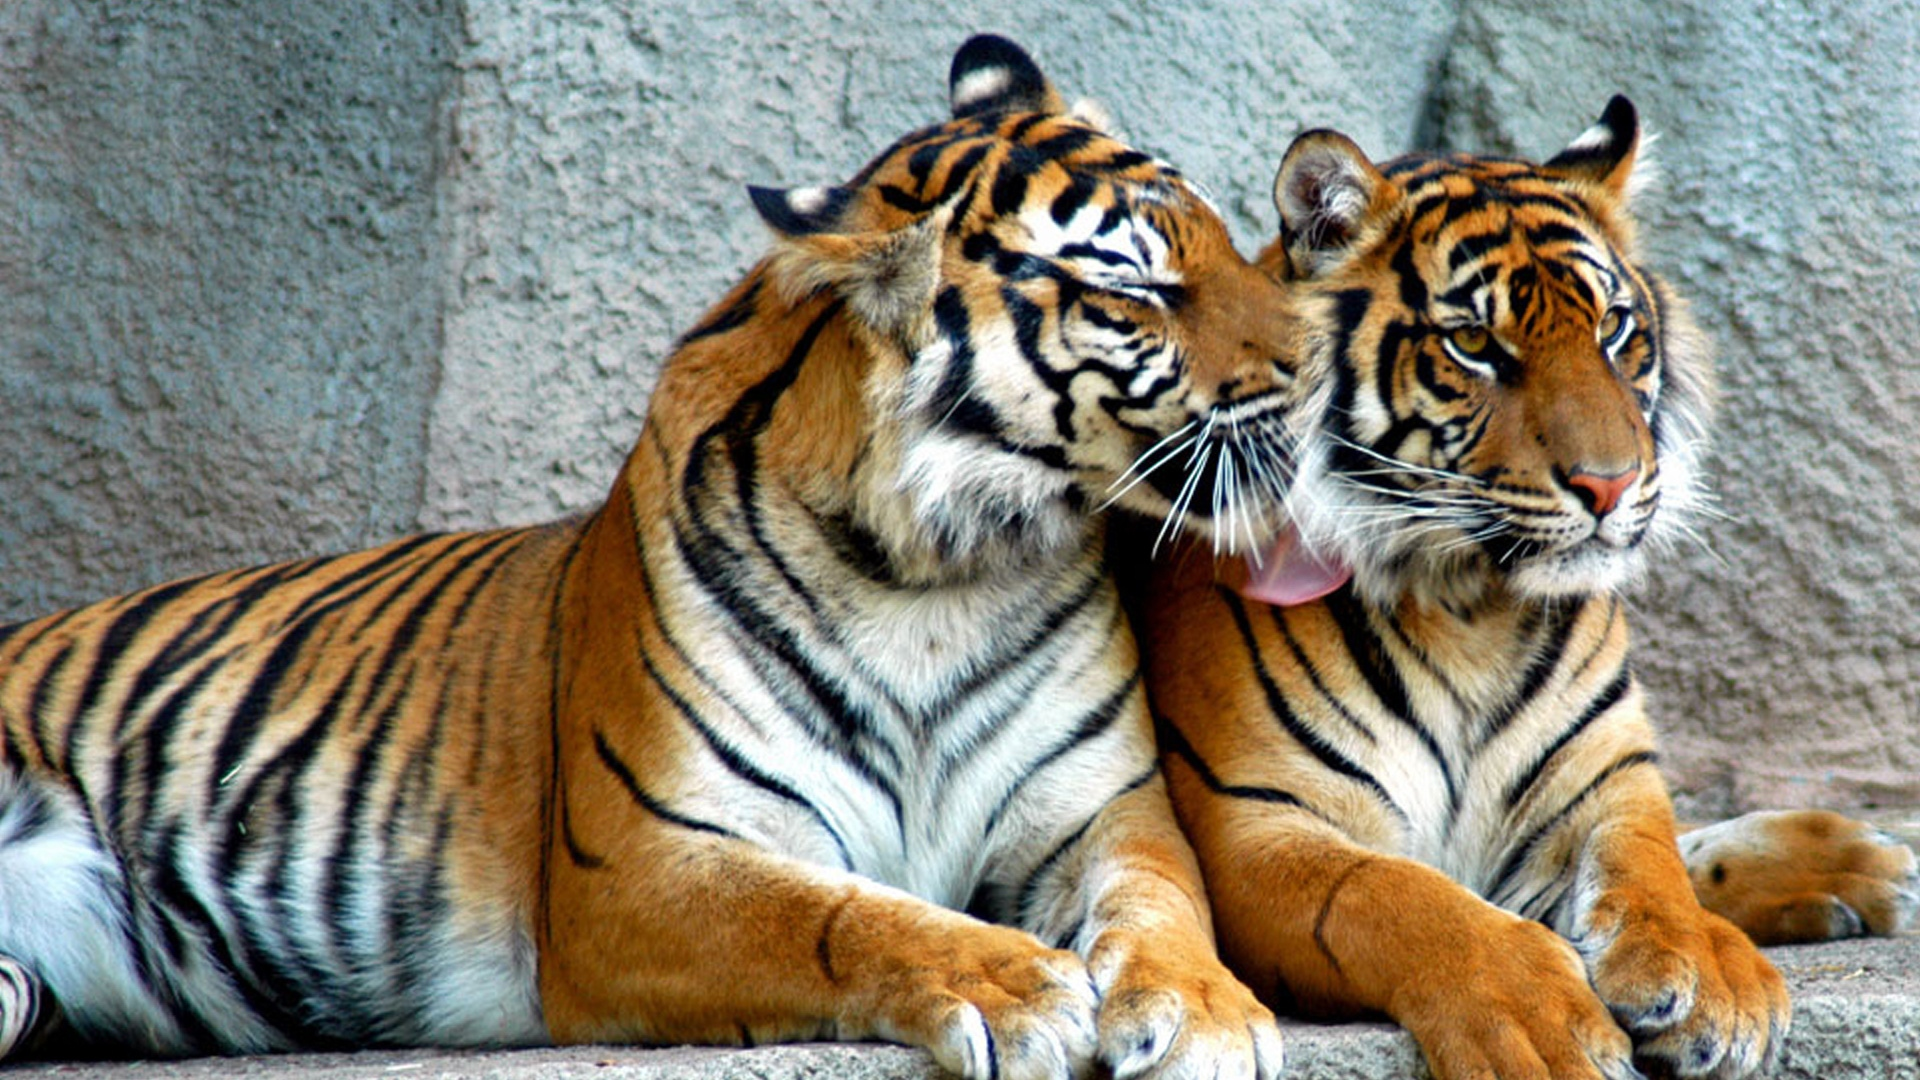 download wallpaper 1920x1080 tiger, couple, predators, striped, big